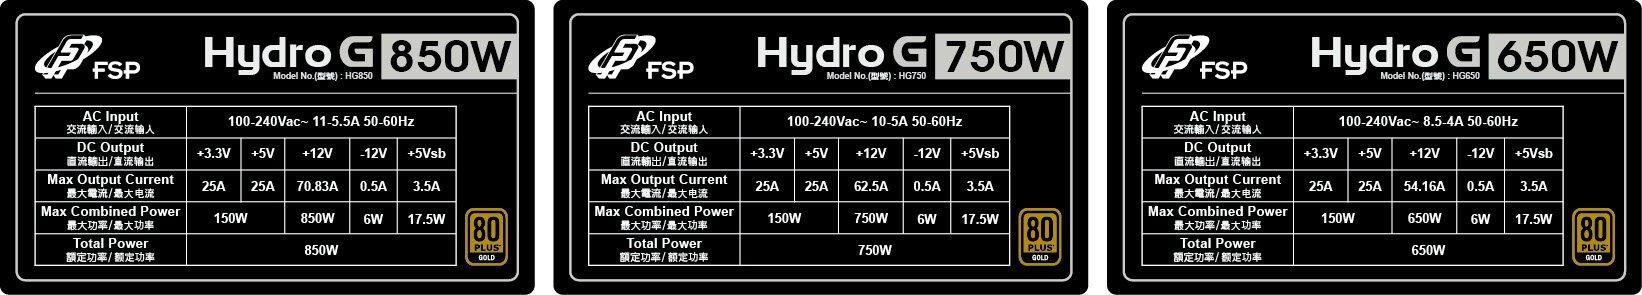 FSP-Hydro-Series-PSU-PR-2